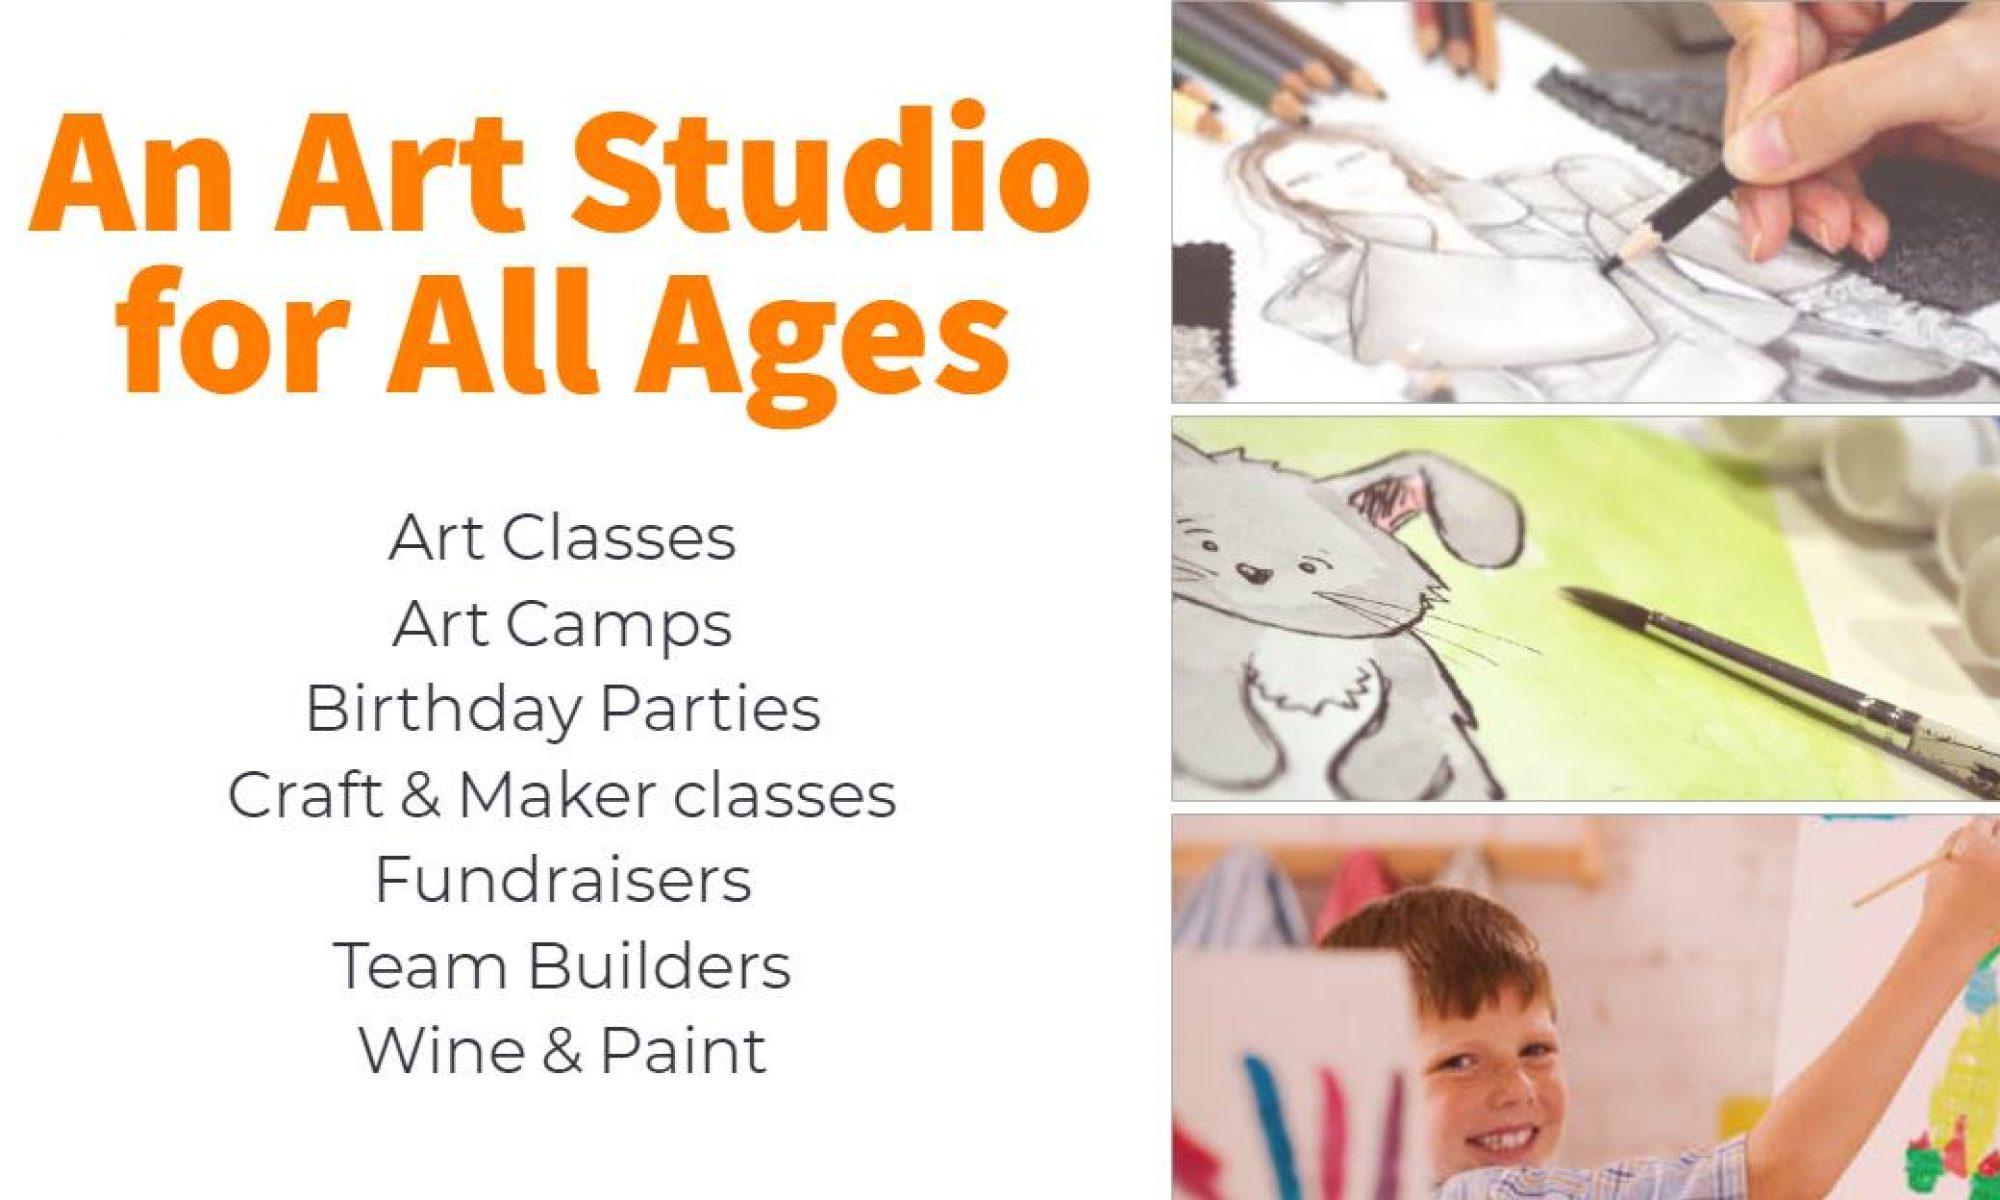 Kreeayt Art Studio